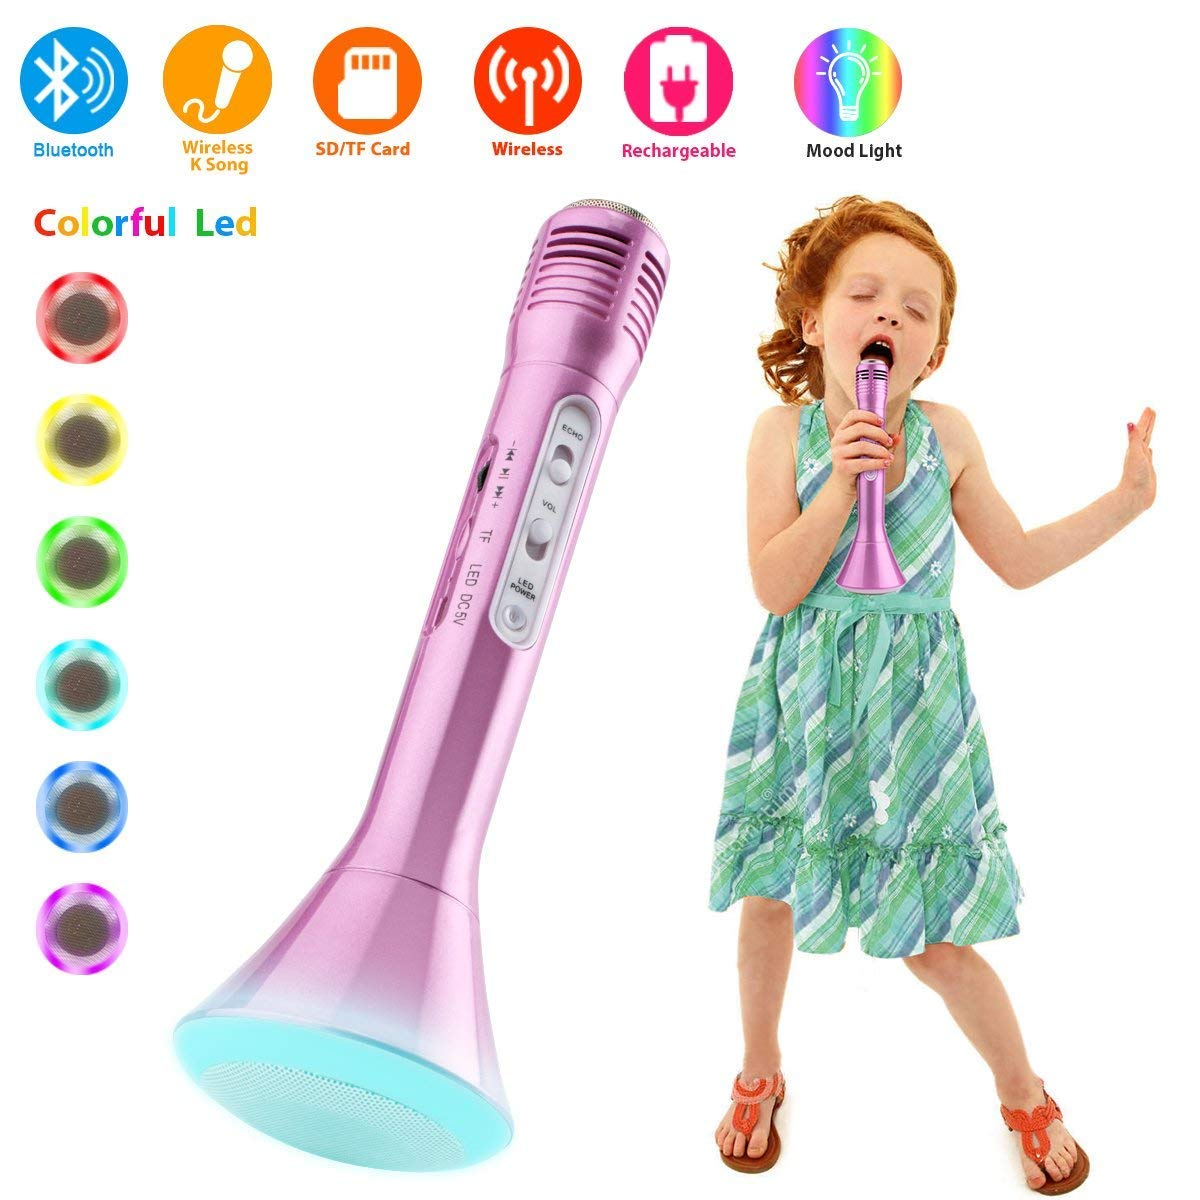 Home Party Ktv Microphone Lautsprecher f/ür iPhone//Android//iPad//PC Smartphone BONAOK Wireless Bluetooth Karaoke Mikrofon Kinder,Tragbares 3 in 1 Karaoke Mikrofon Bluetooth Karaoke Rot